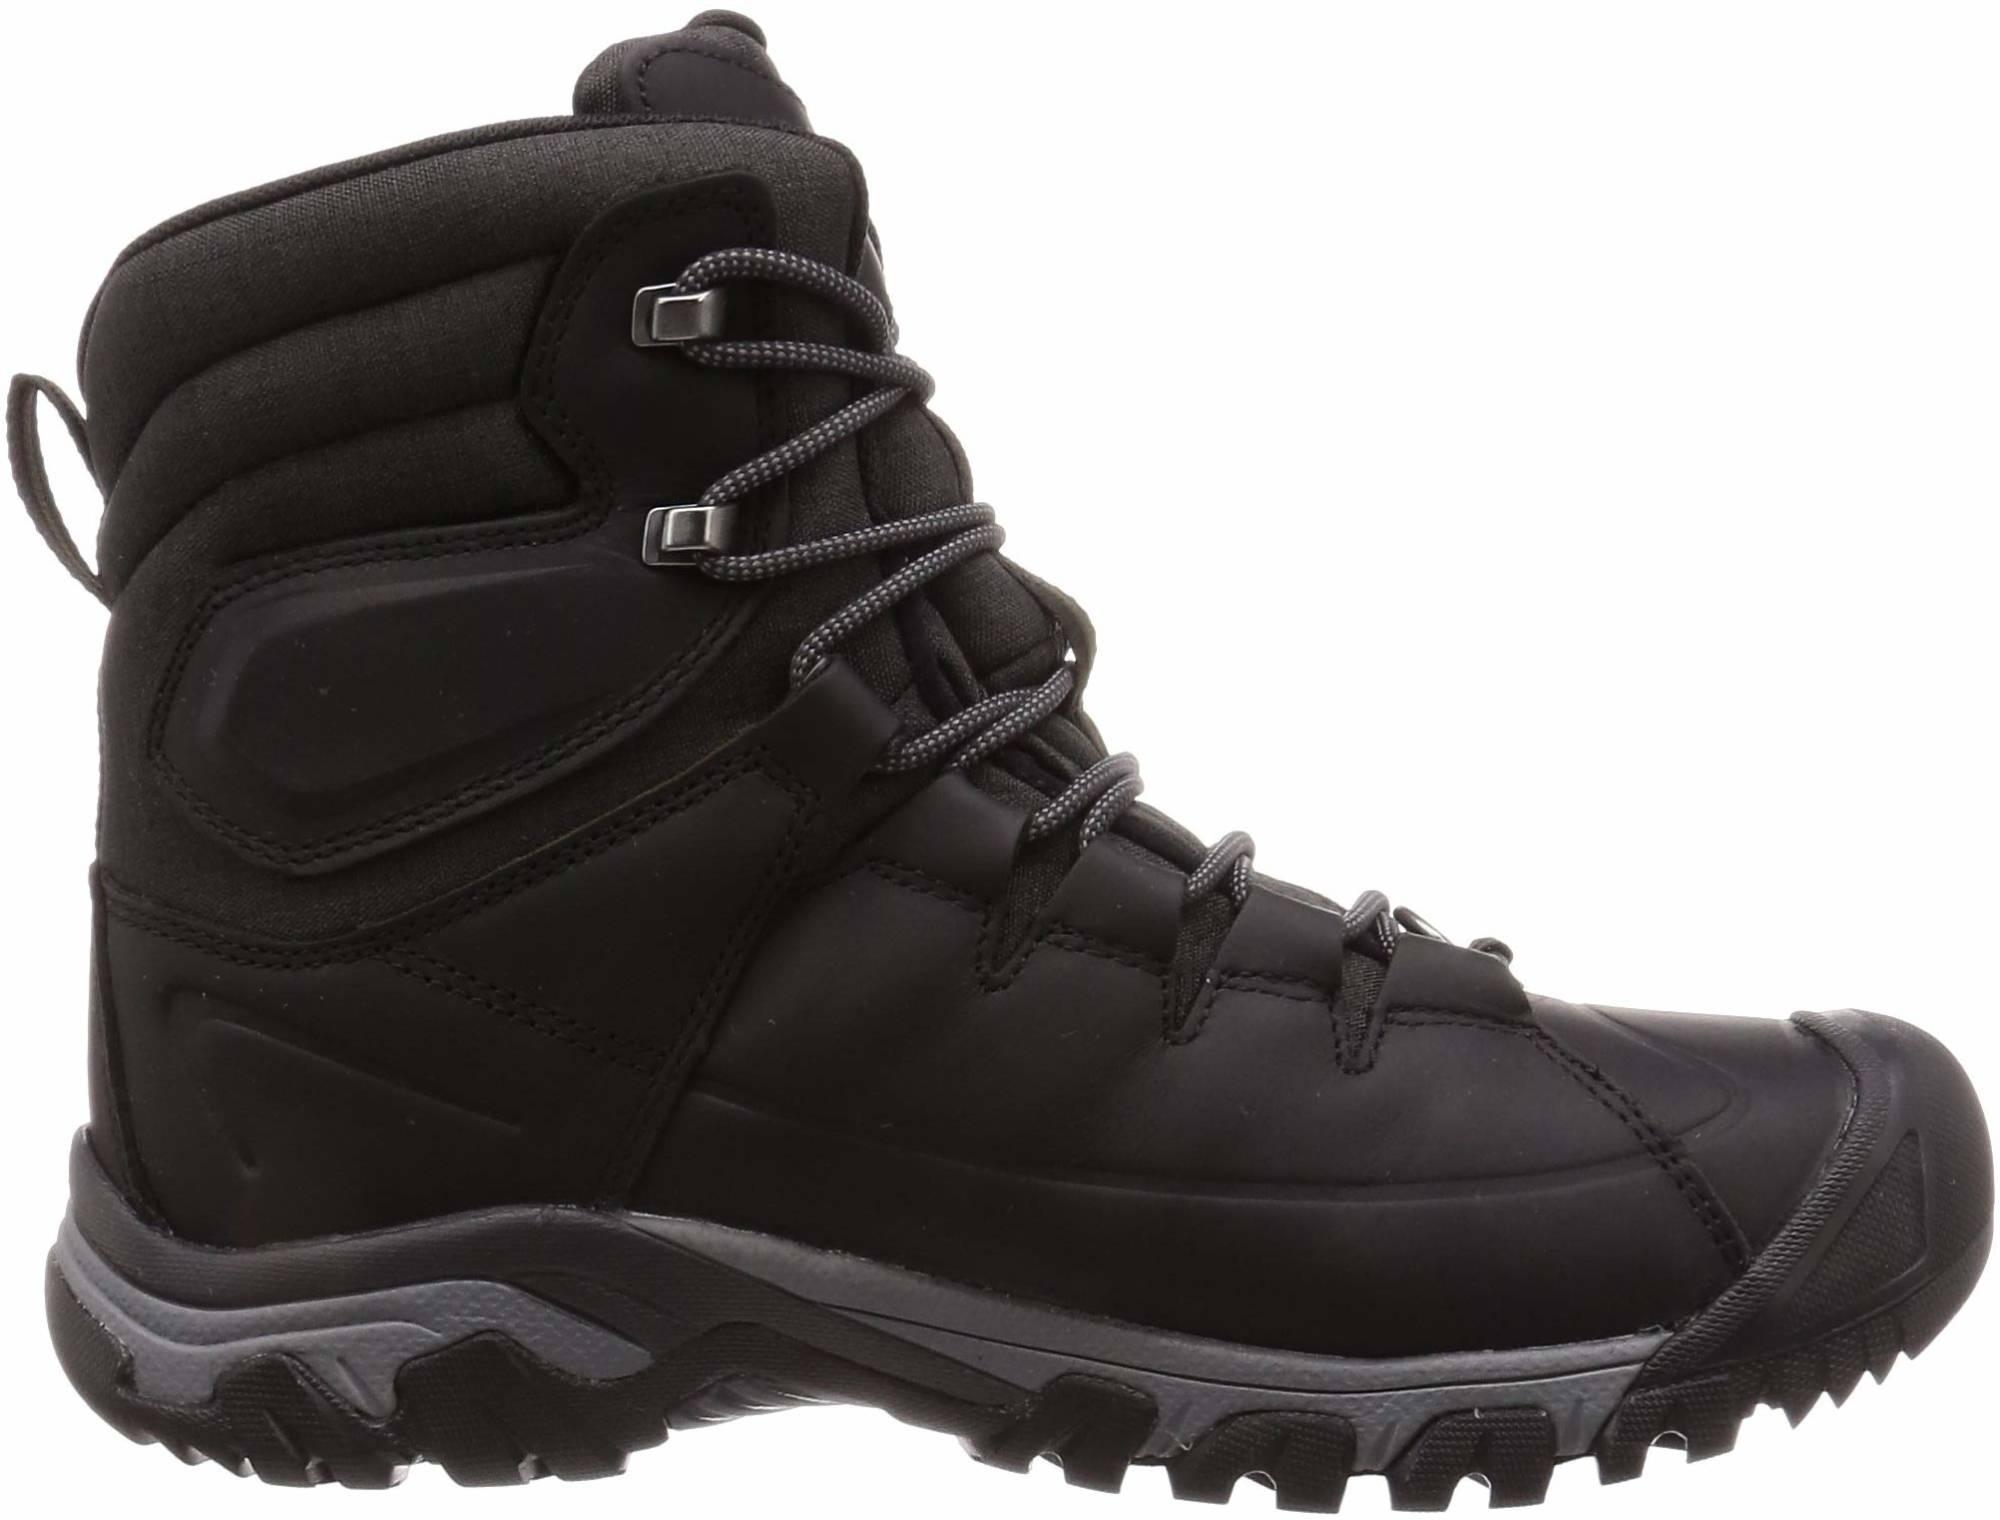 KEEN Targhee High Lace Waterproof Boot